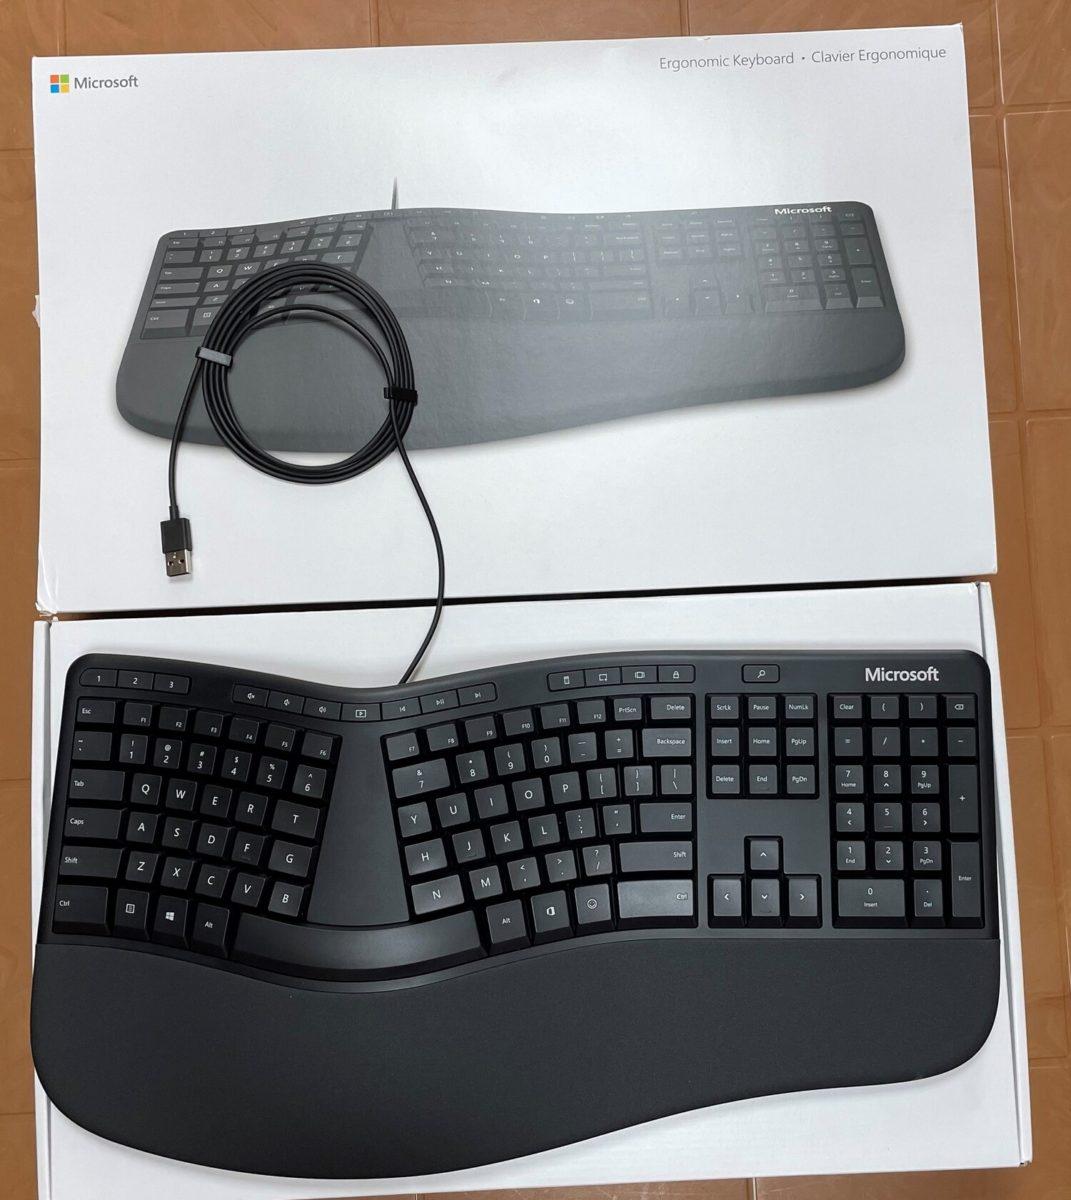 Microsoft Ergonomic Keyboard (2019), LXM-00001